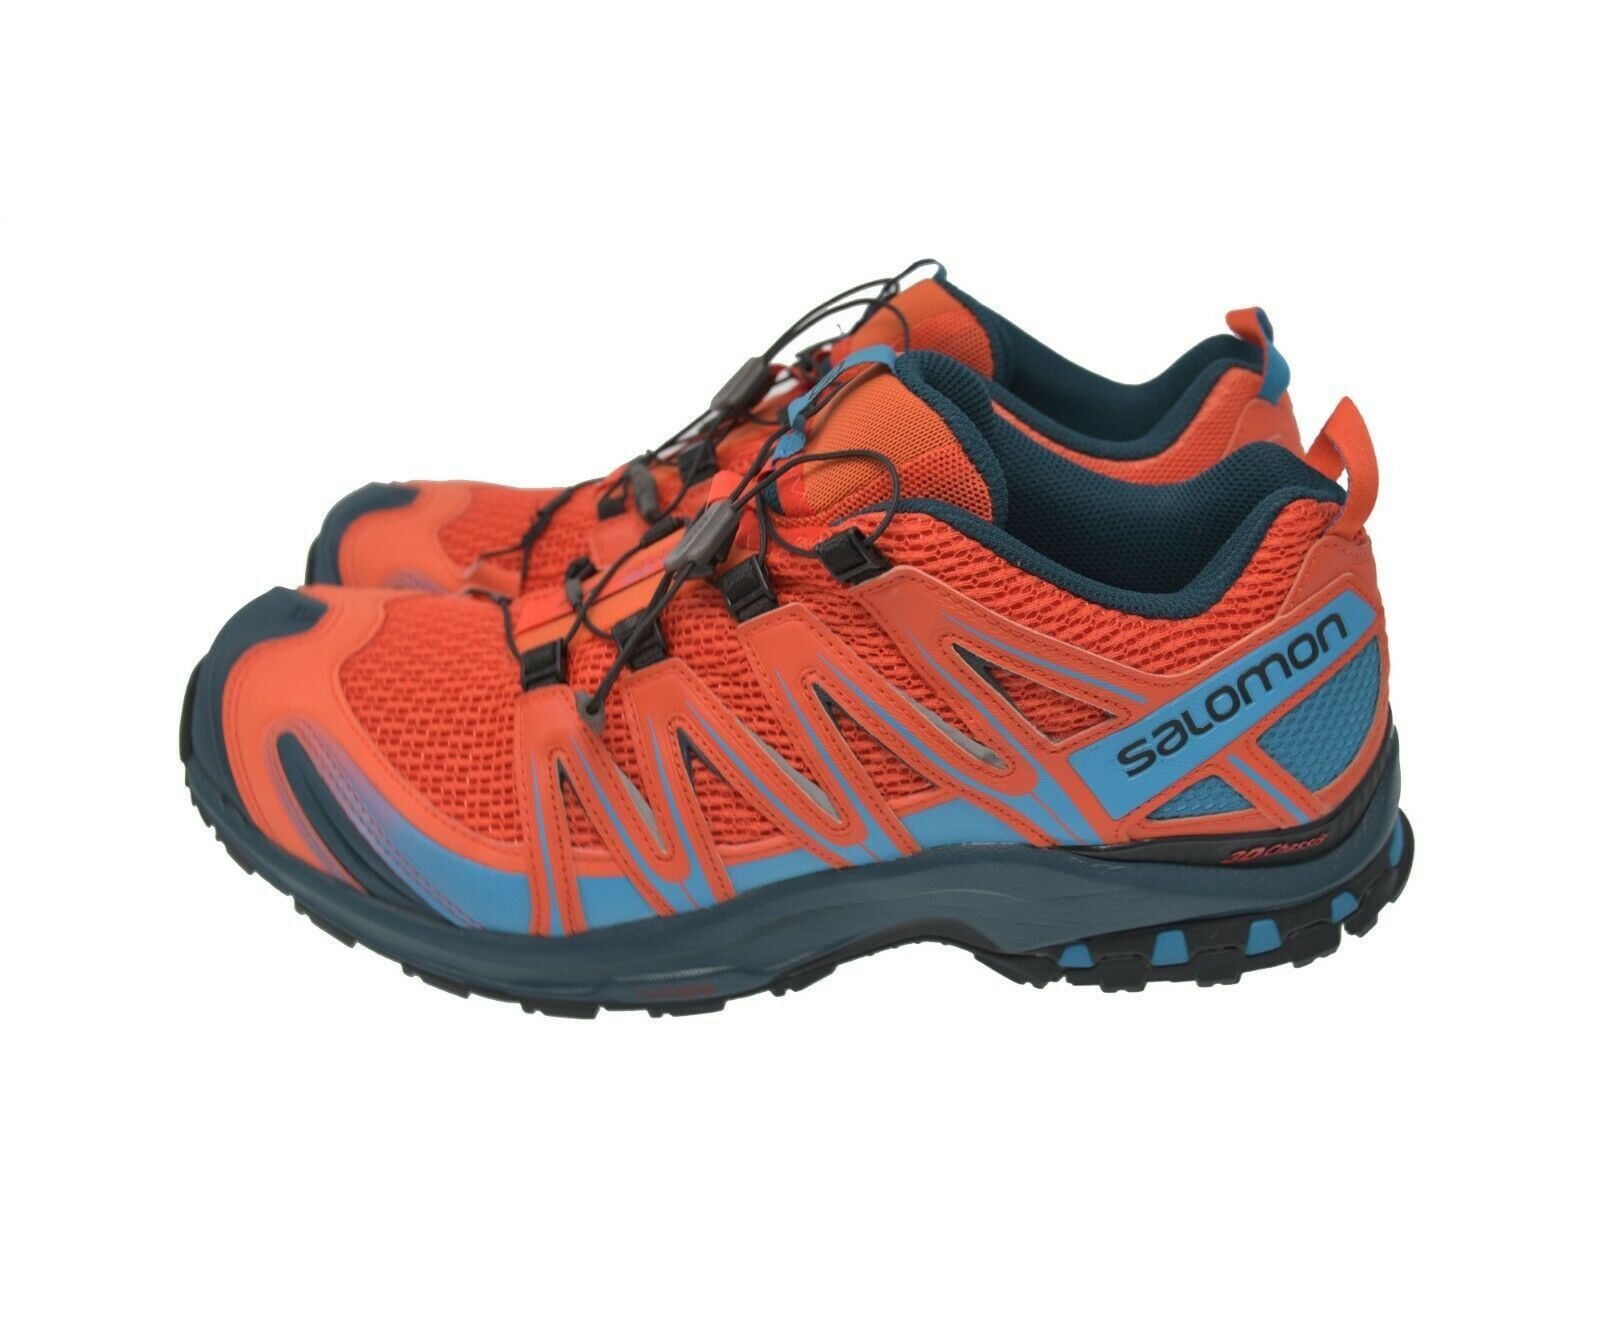 Solomon XA PRO 3D Trail Running Men's Sz 12.5 EU 47.5 Hiking Trail Sports Shoes image 3